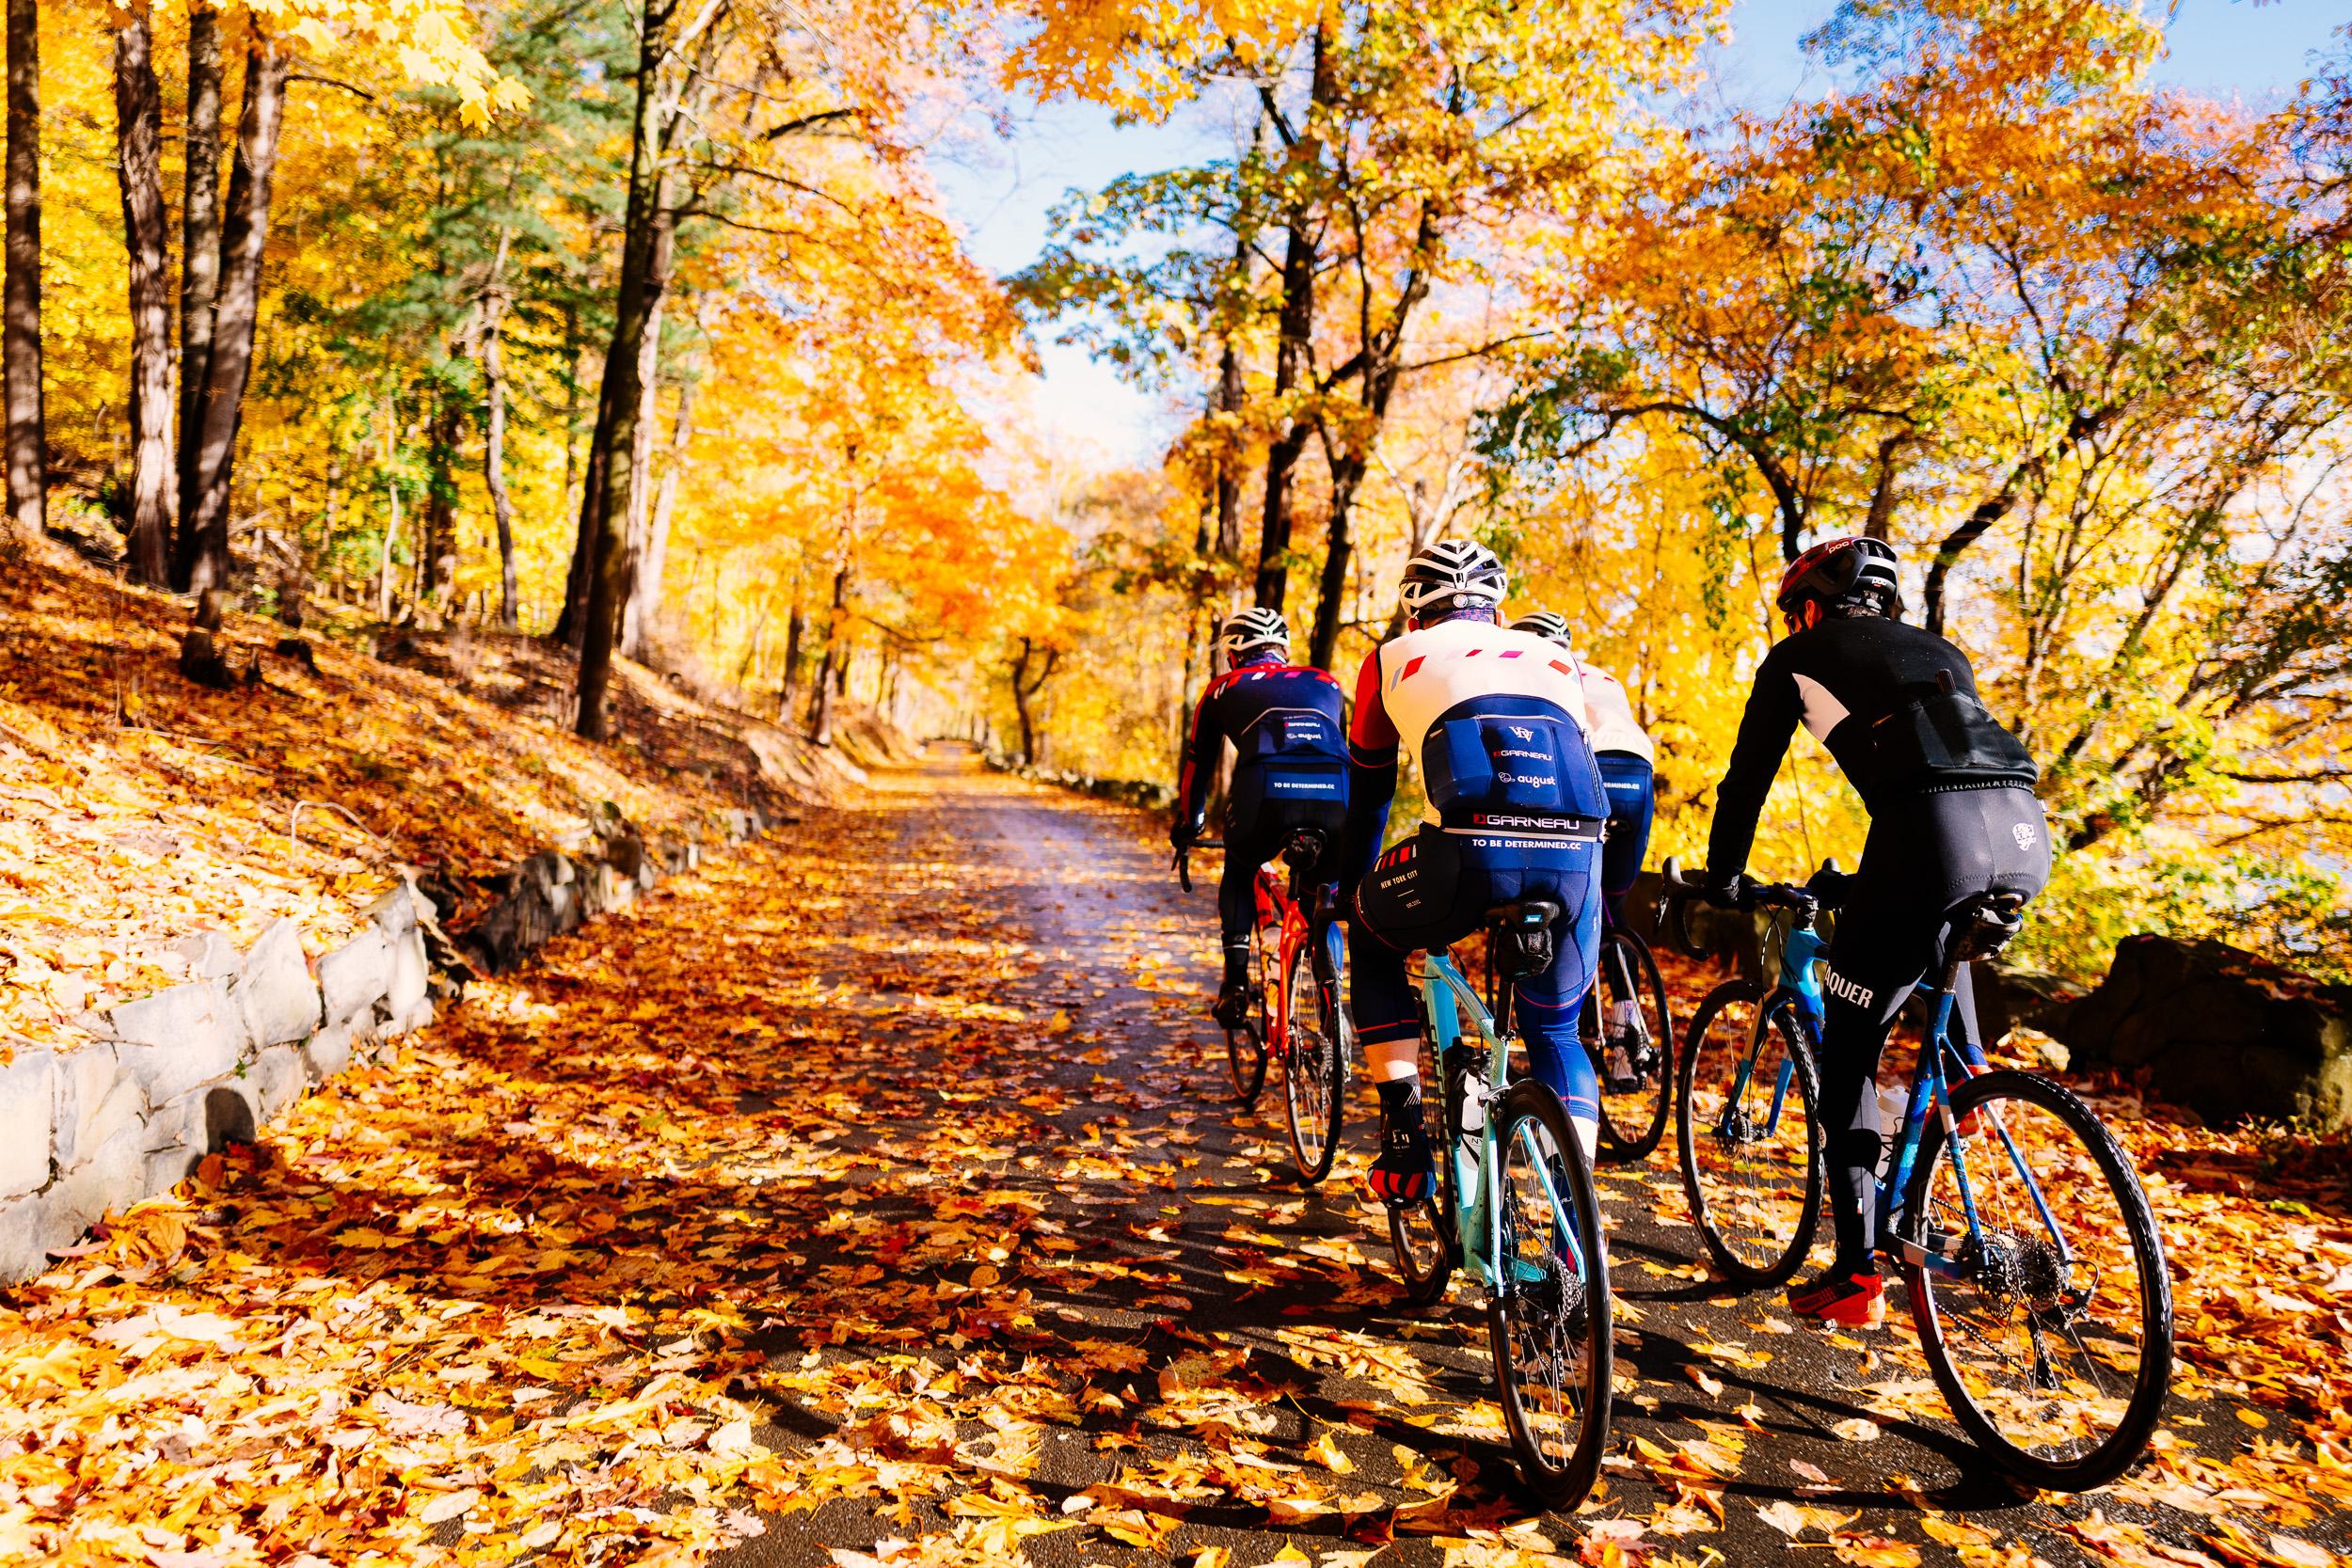 photo-rhetoric-to-be-determined-river-road-fall-foliage-5030.jpg